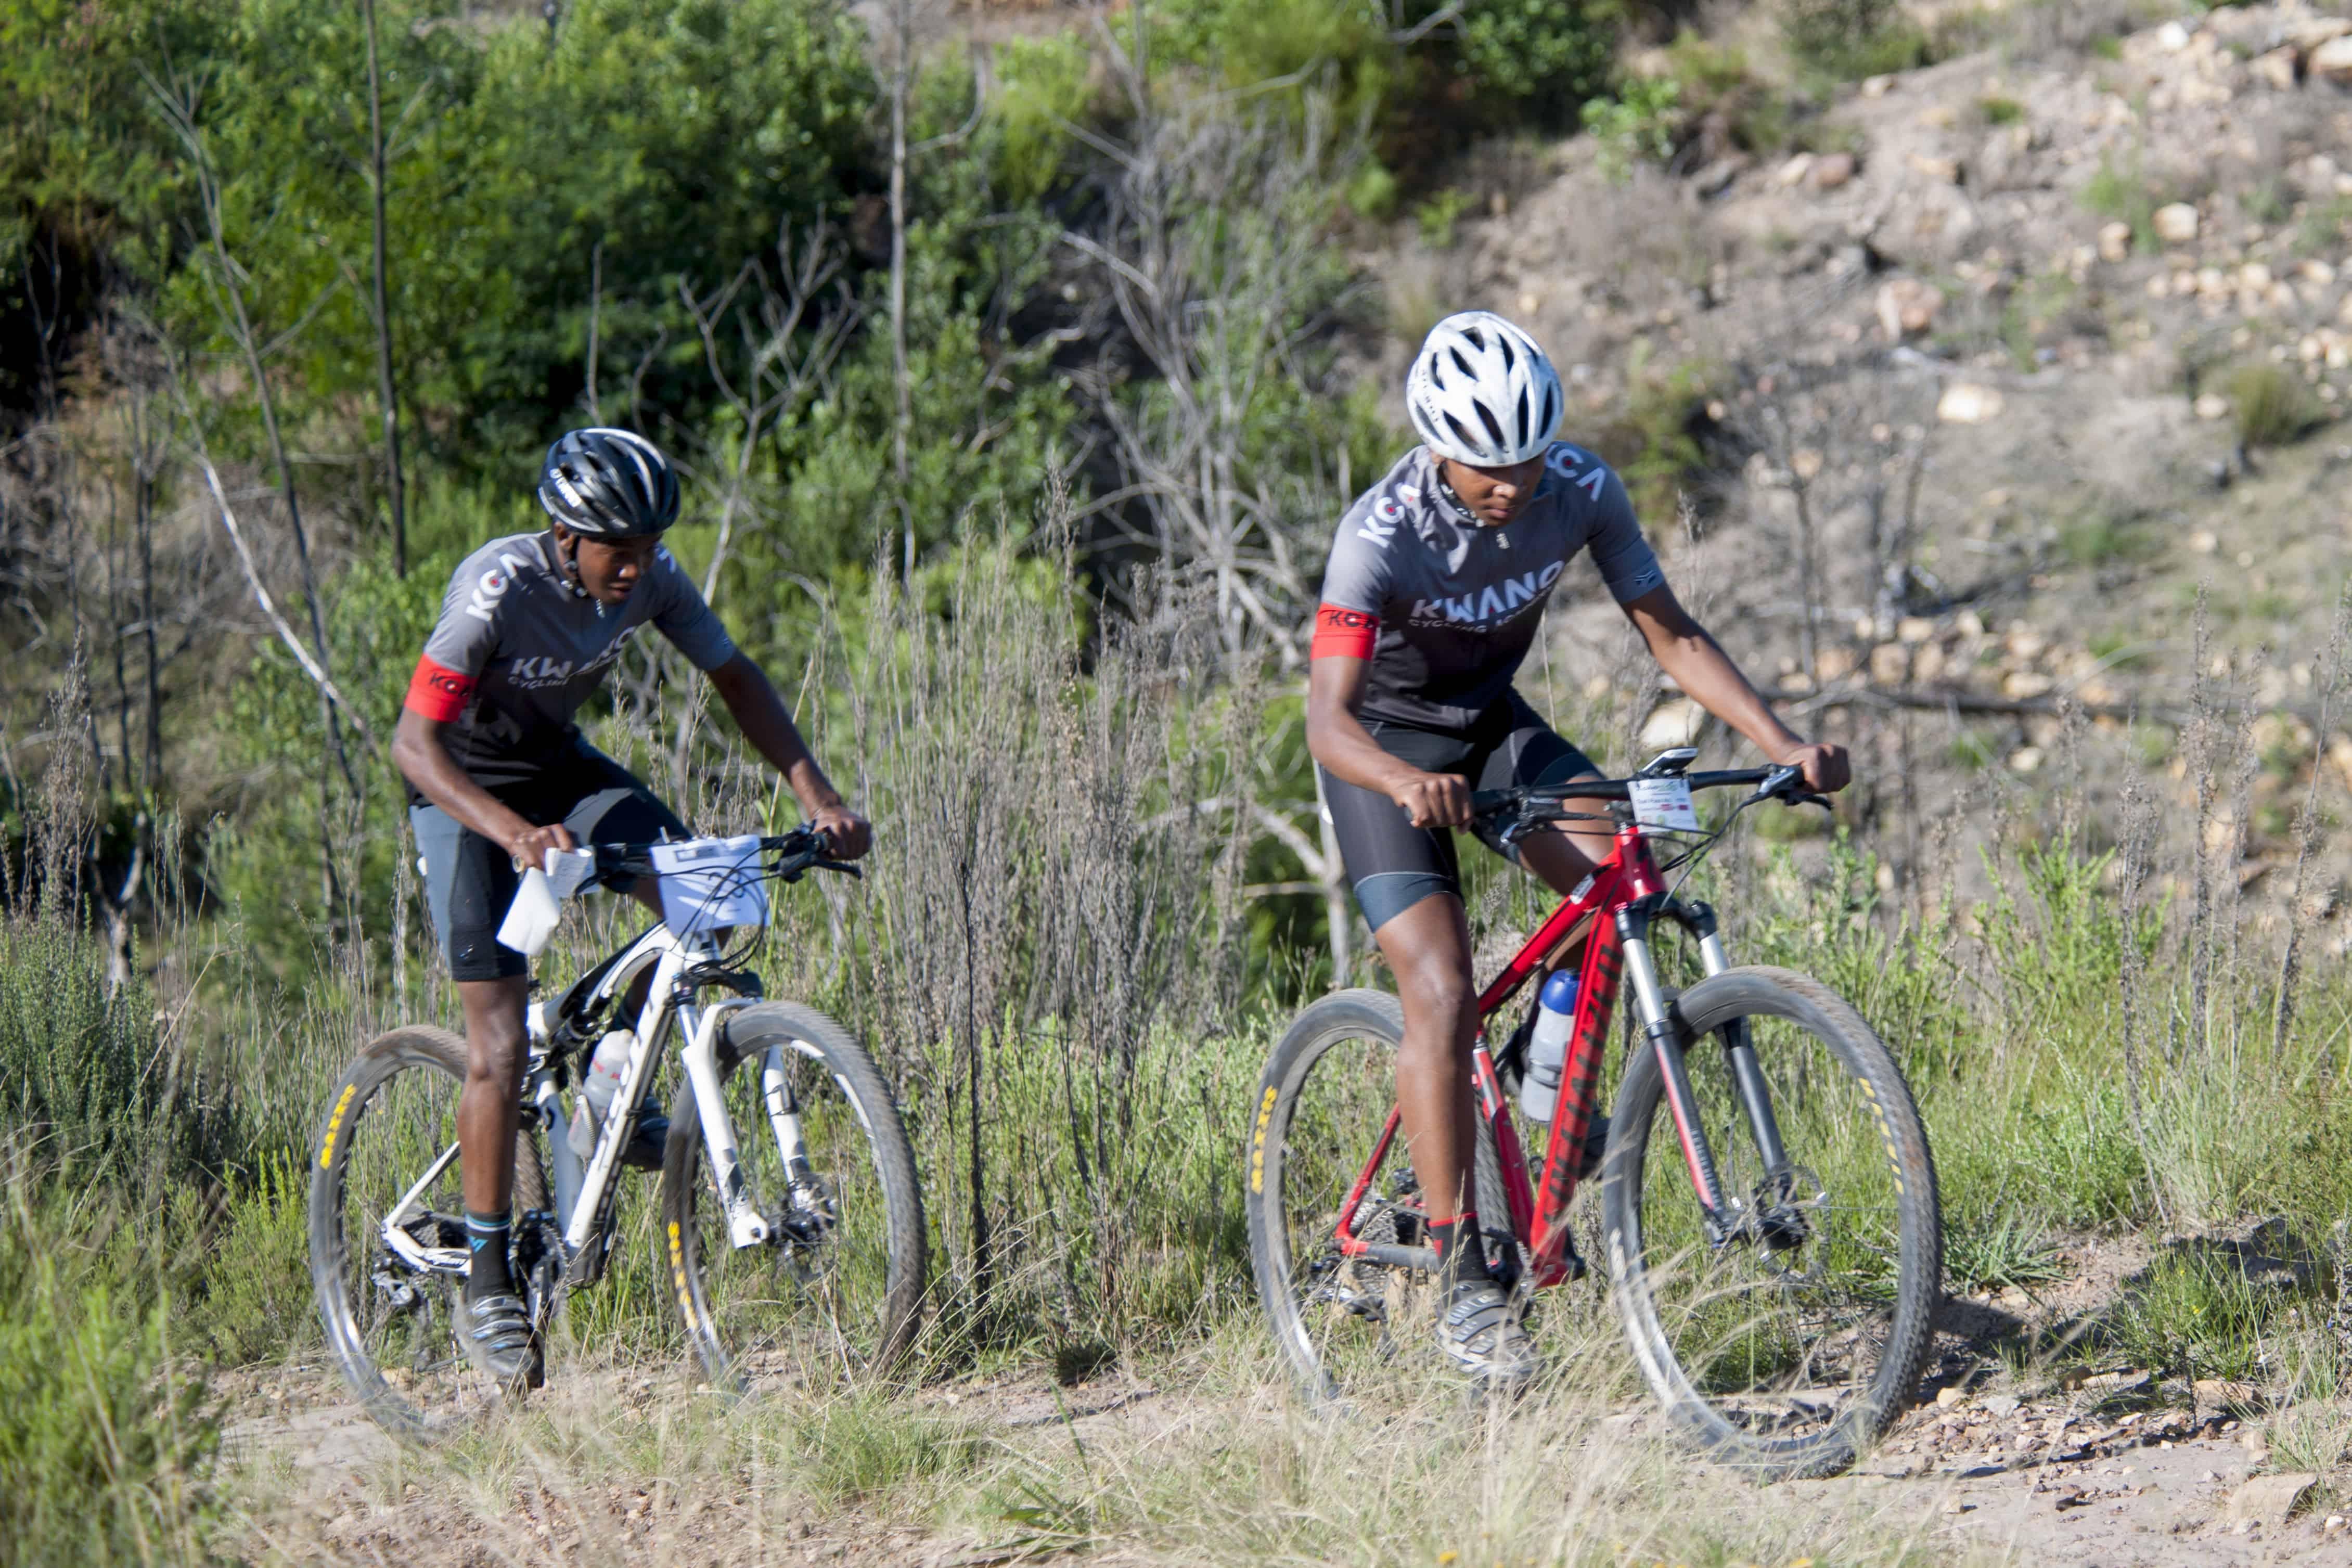 Tour de Plett | Bicycling Race Calendar